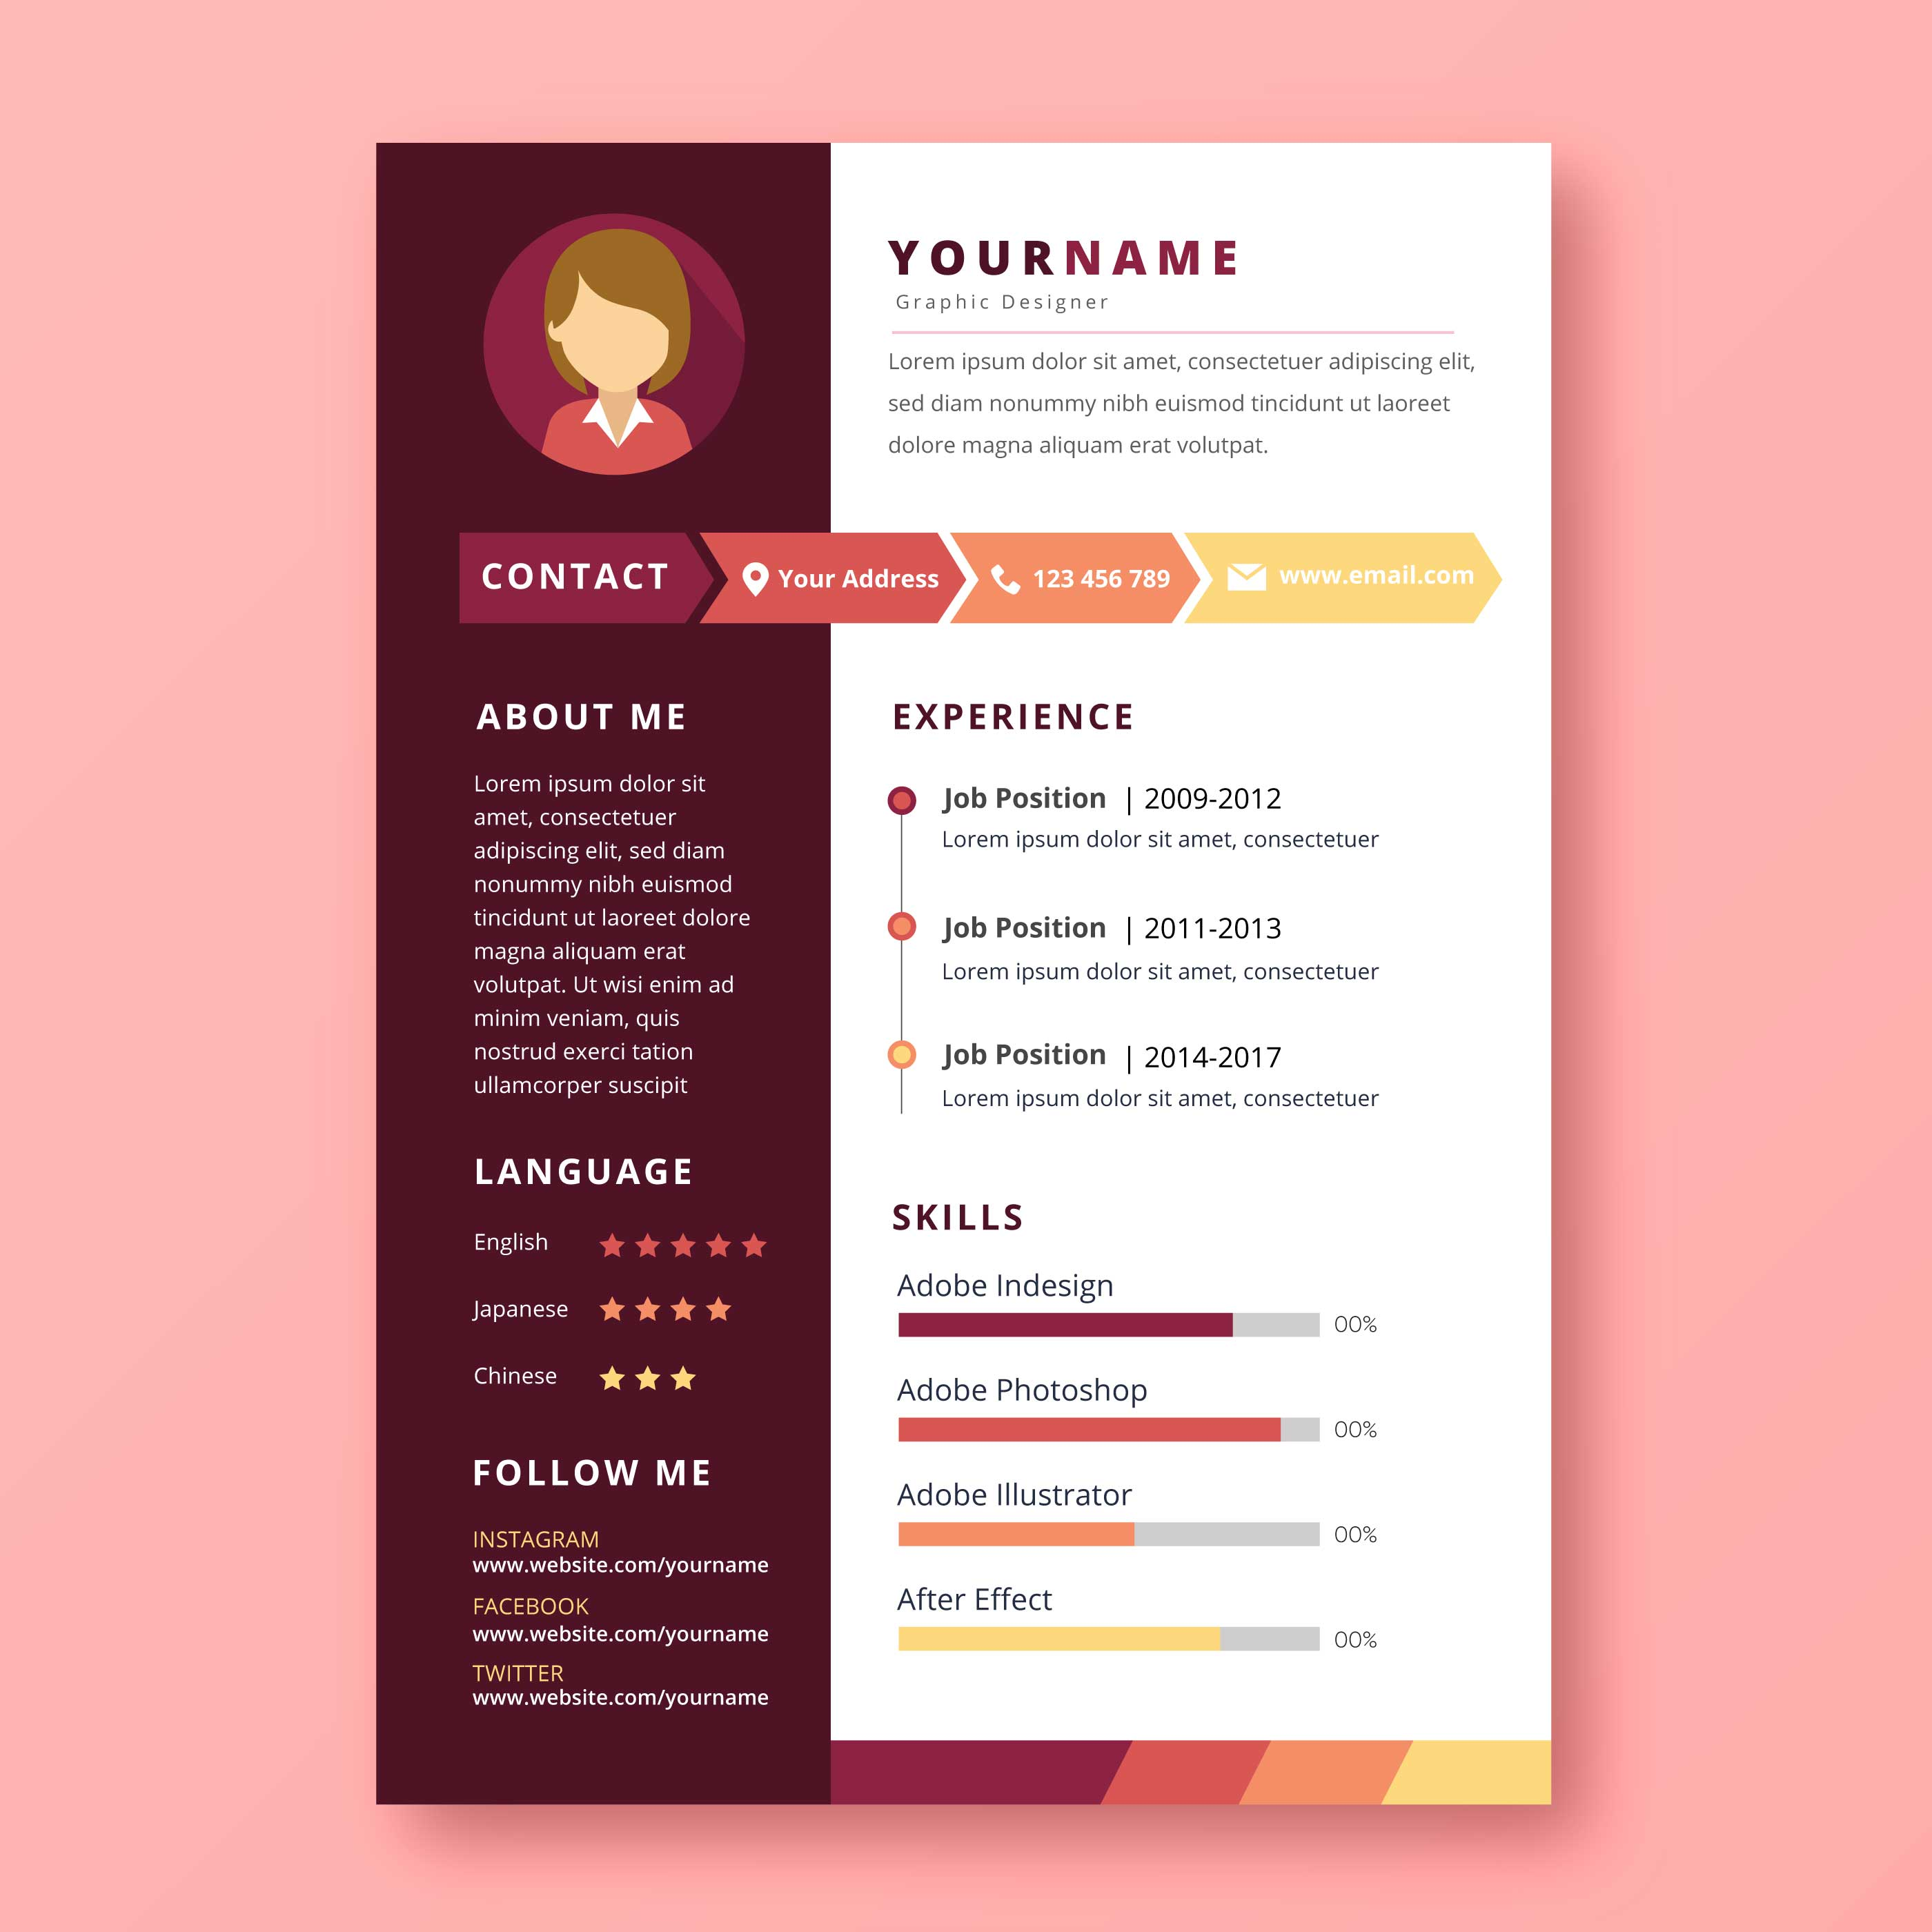 Graphic Designer Resume  Download Free Vector Art Stock Graphics  Images